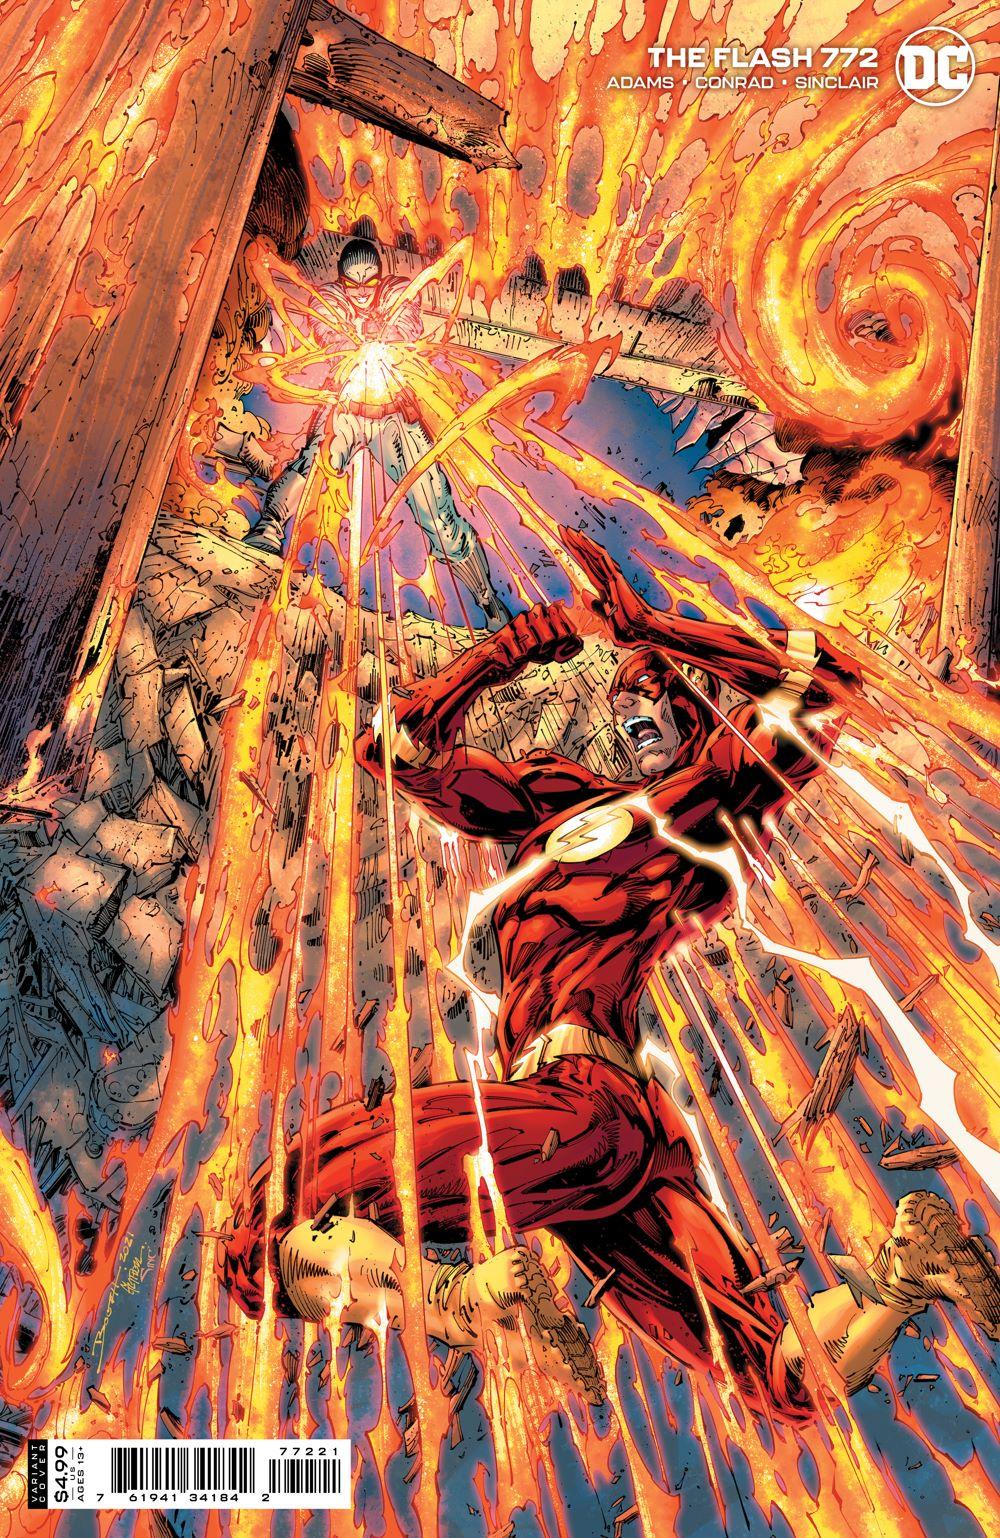 THEFLASH_Cv772_var DC Comics July 2021 Solicitations